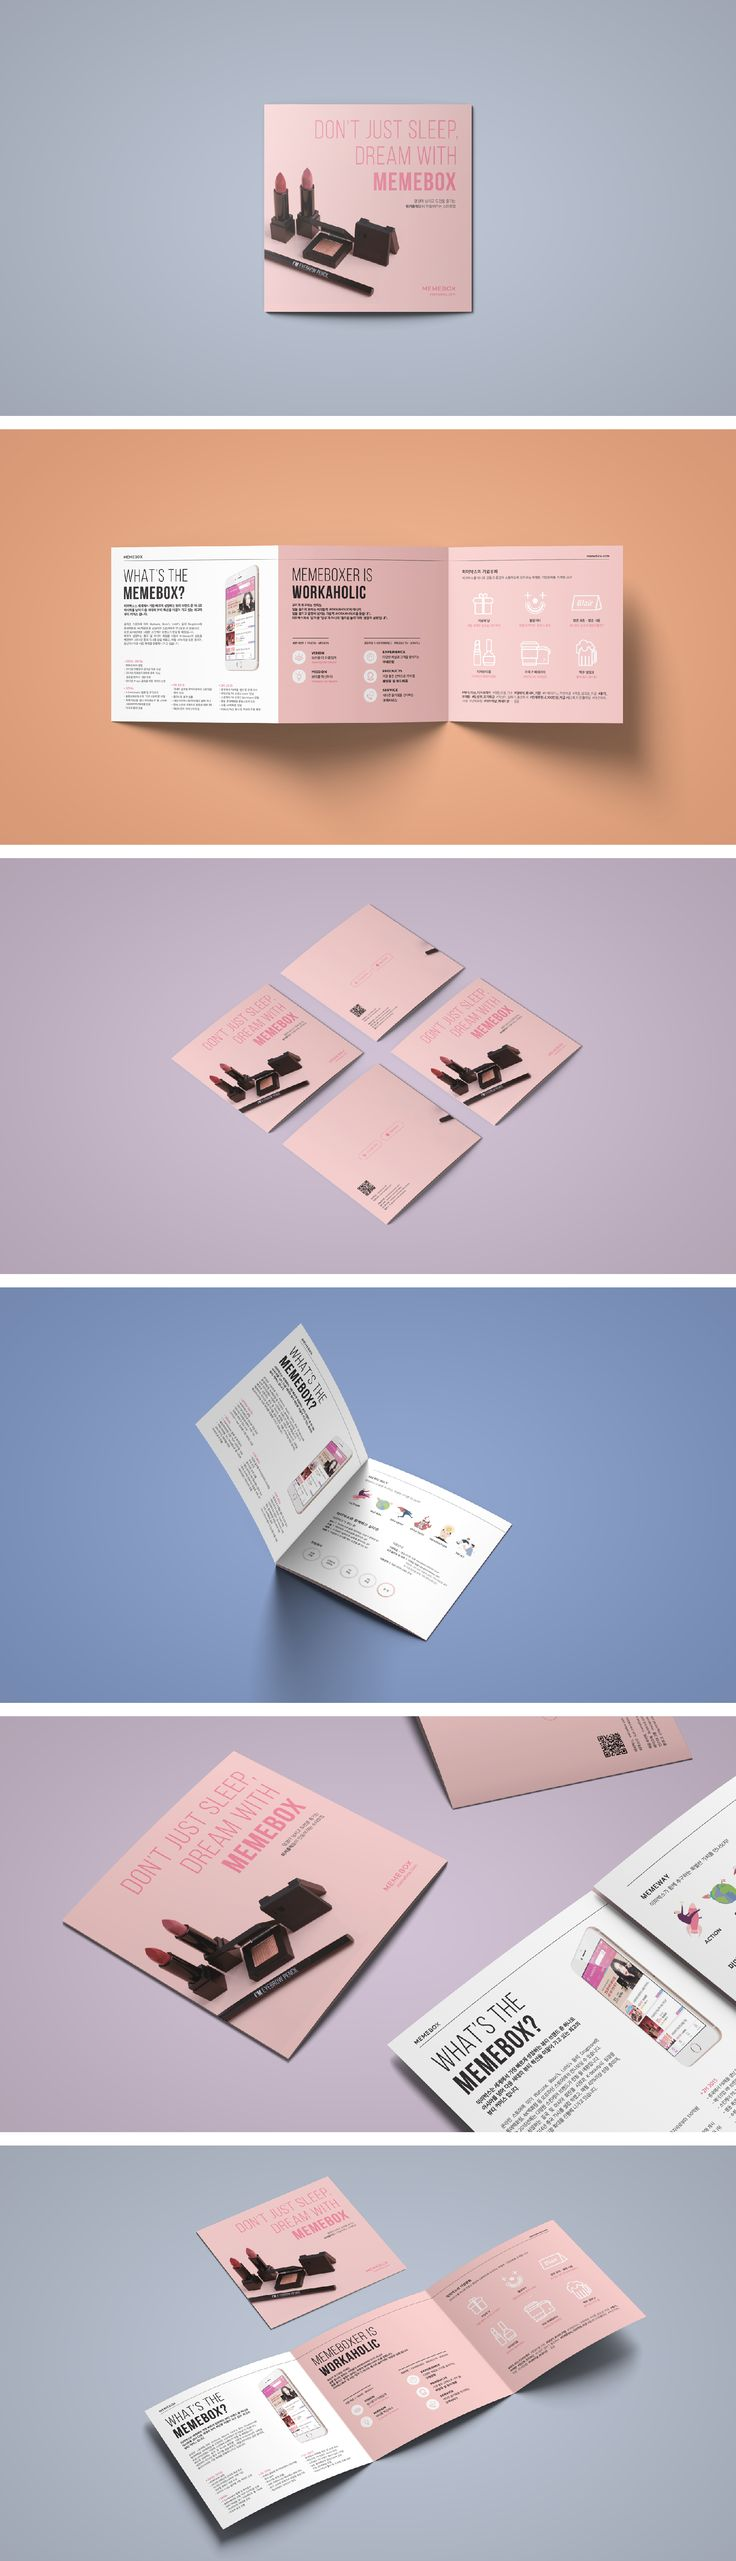 MEMEBOX Company Brochure    뷰티 커머스 '미미박스'의 기업 브로셔입니다. PB제품 아임미미의 브랜드 컬러를 활용하여 작업하였습니다. SIZE_140 x 420 MATERIAL_아트지 250g_무광라미네이팅